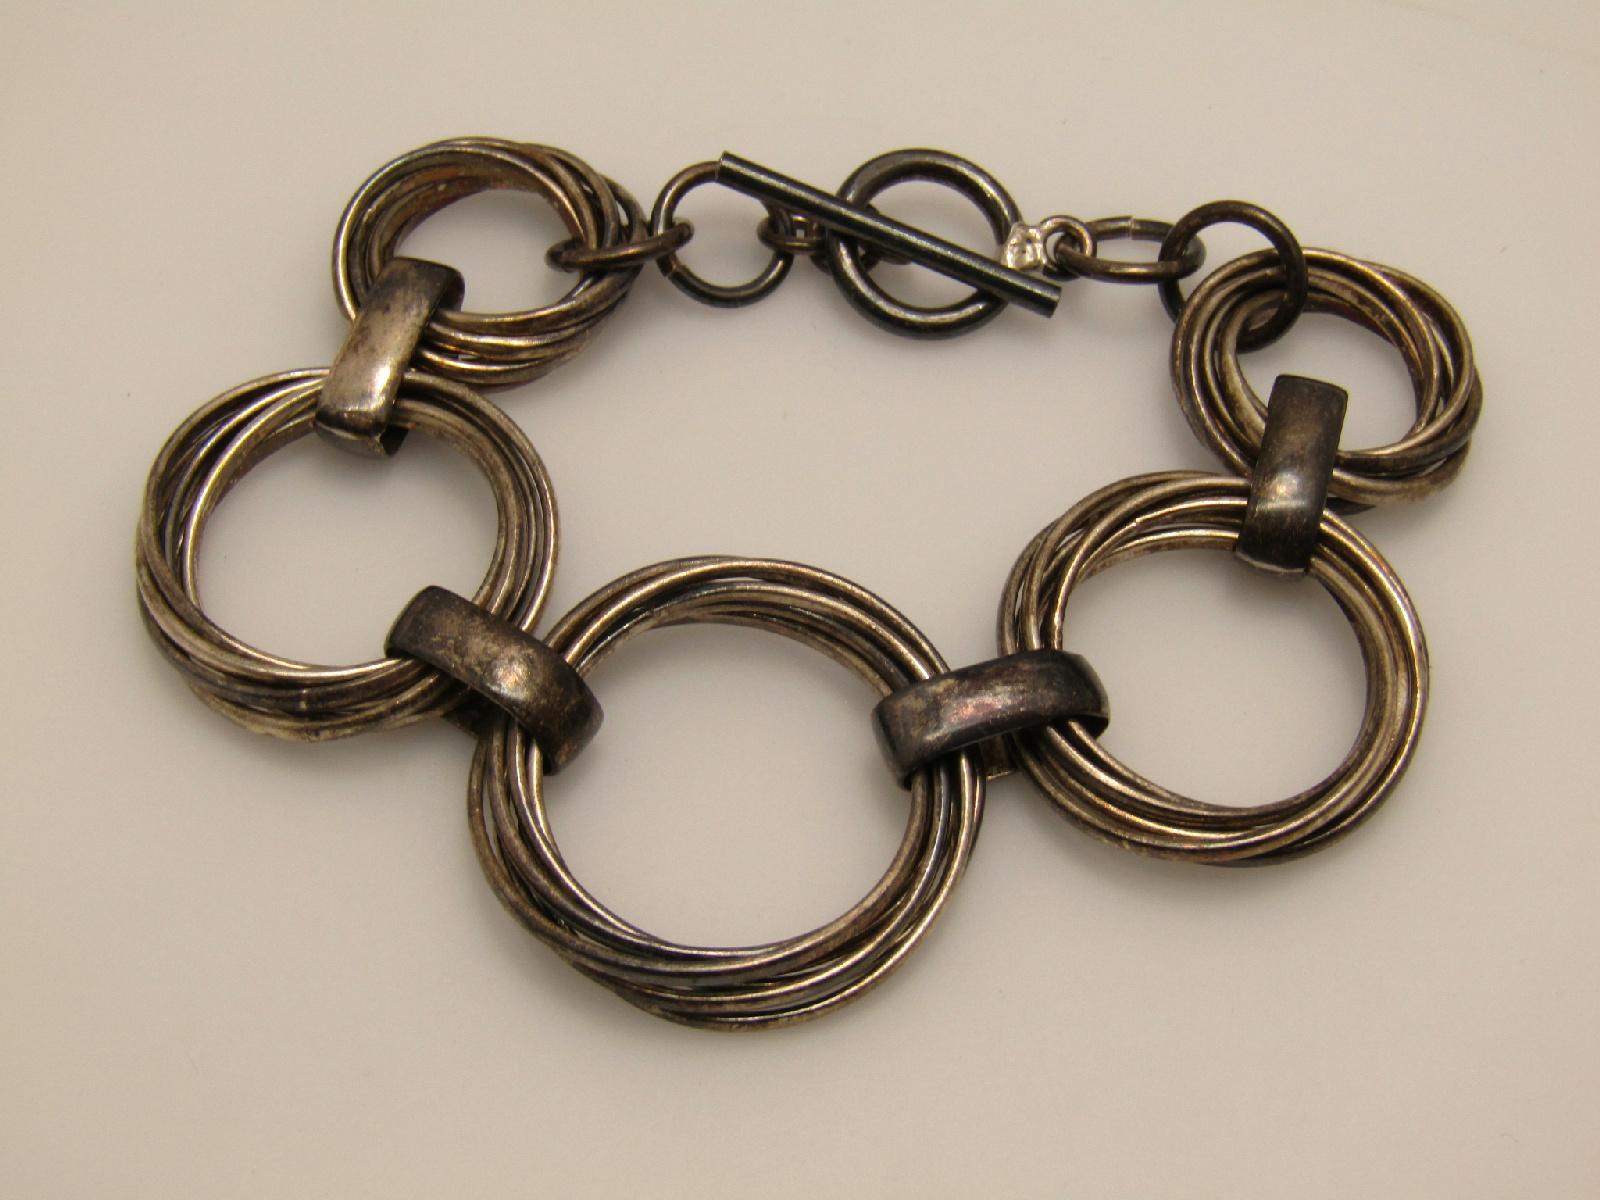 sterling silver jewelry toggle clasp bracelet interlocking